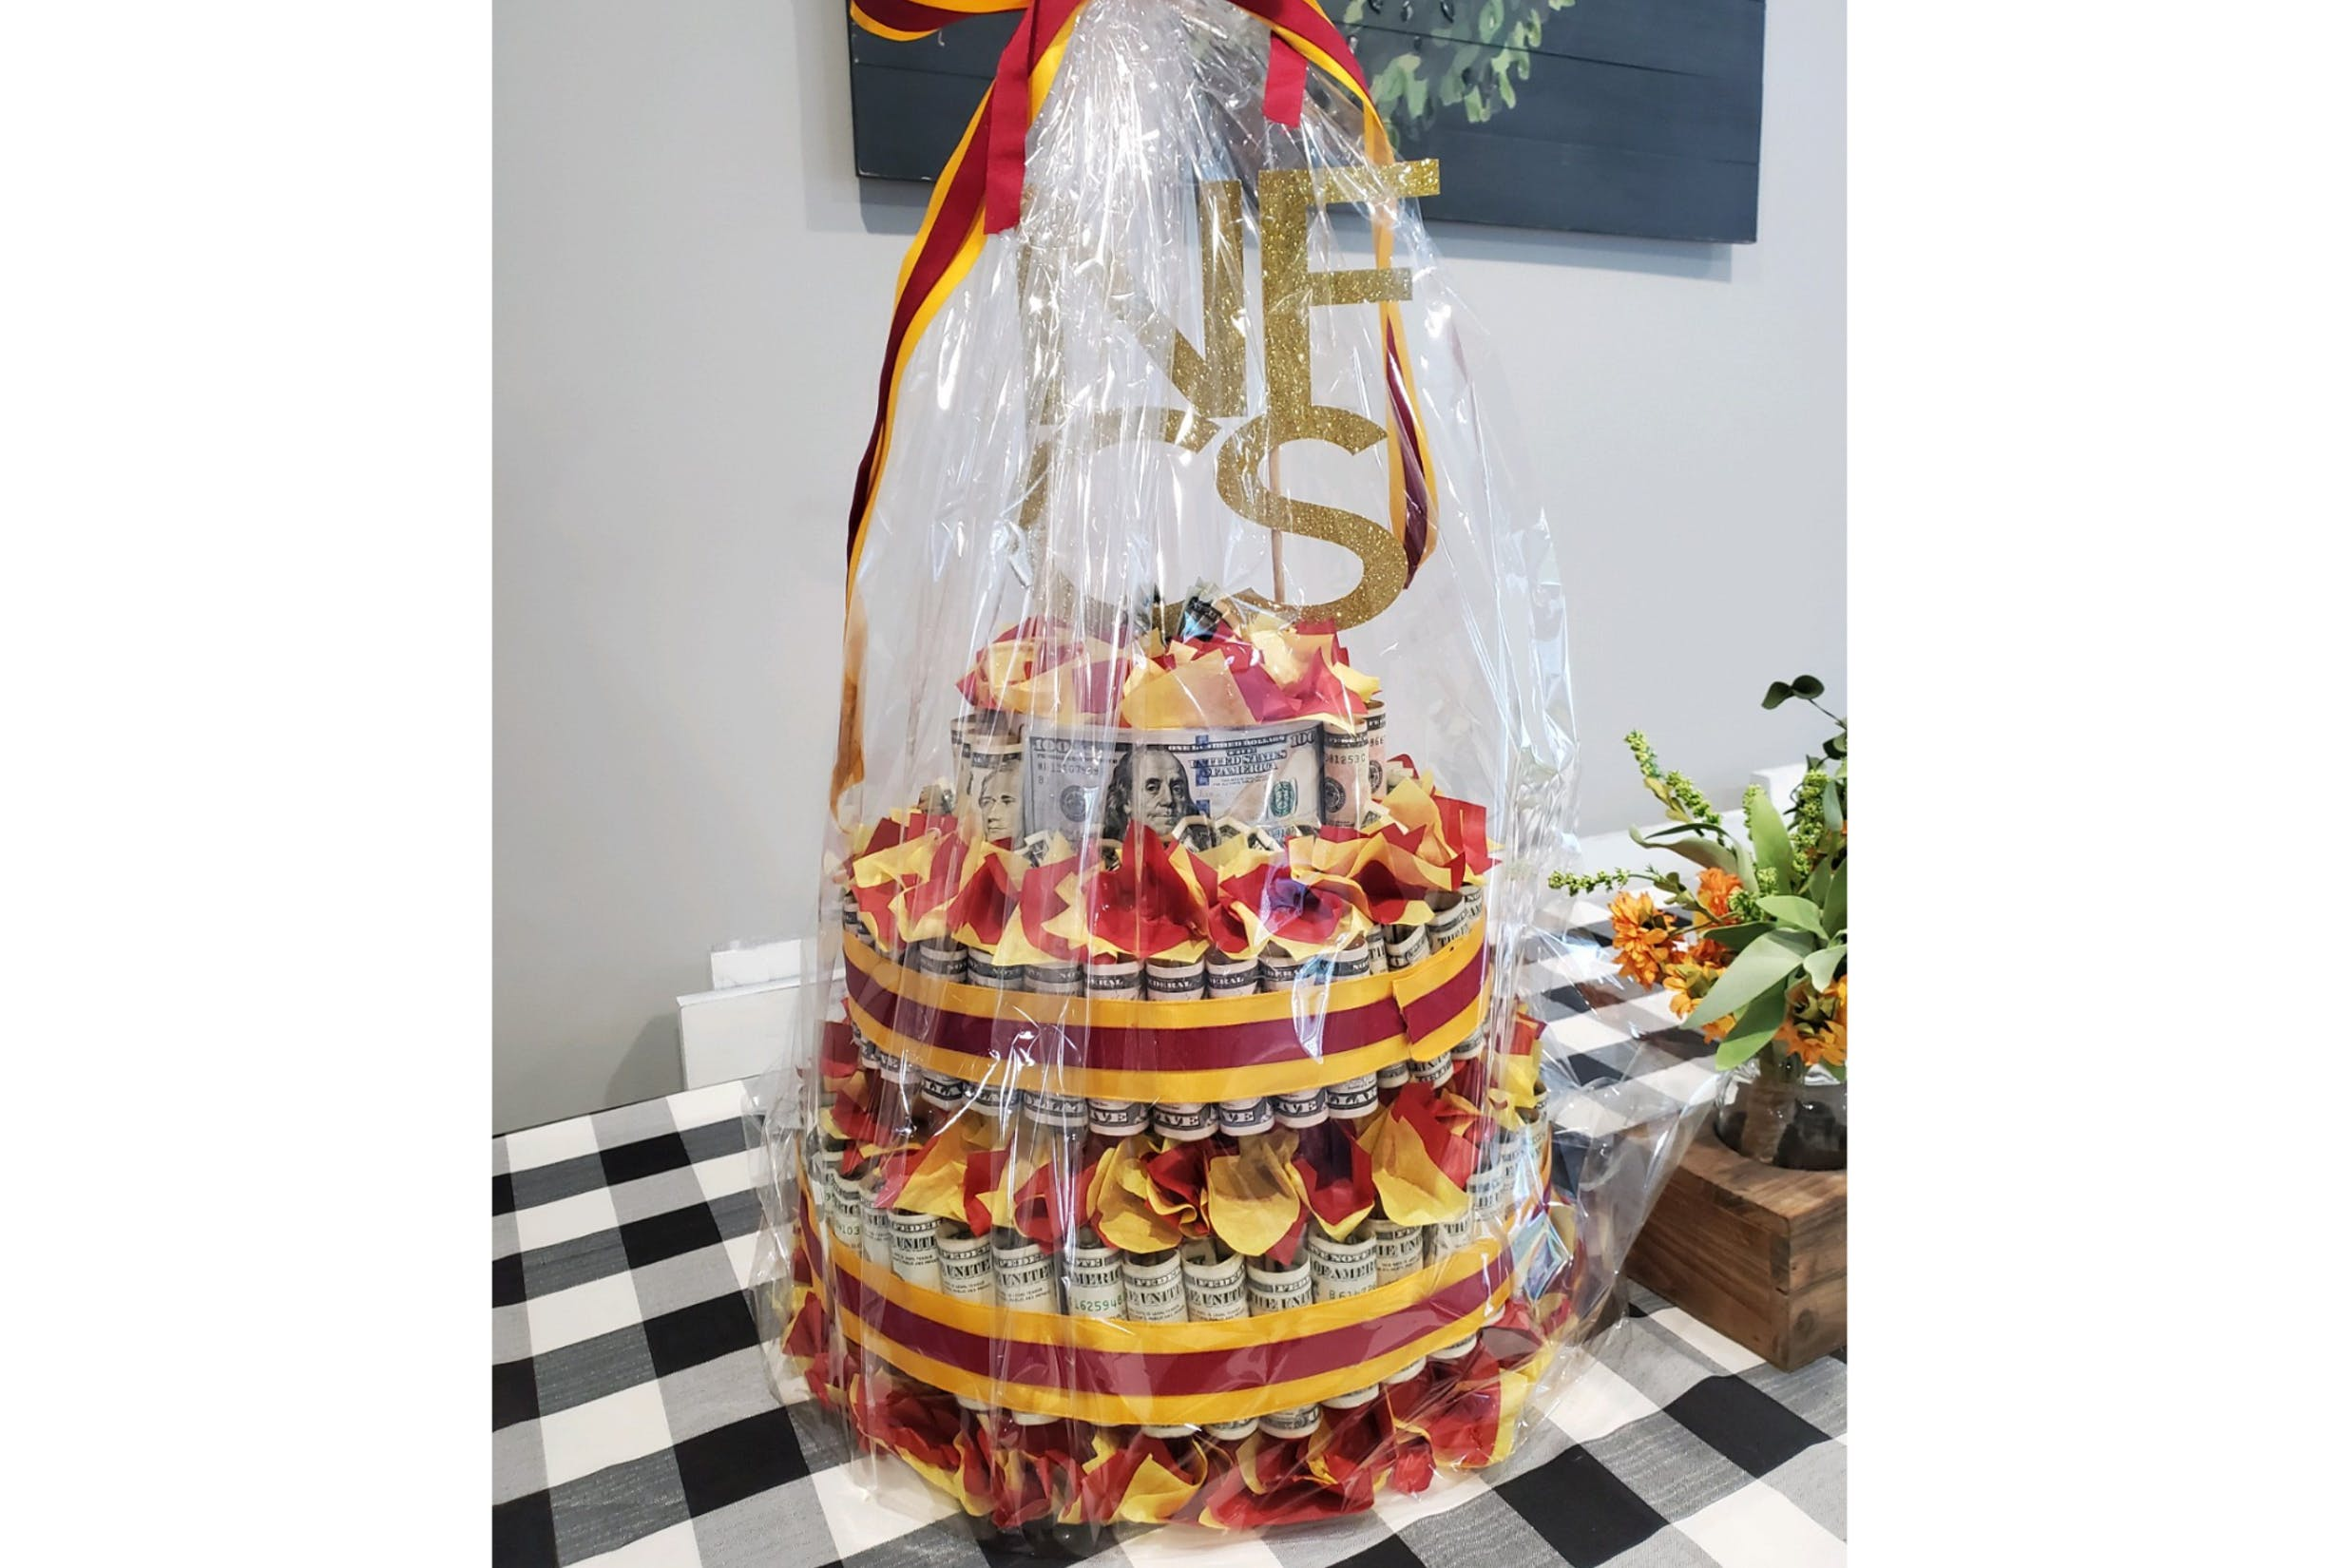 Money Cake Prize Basket